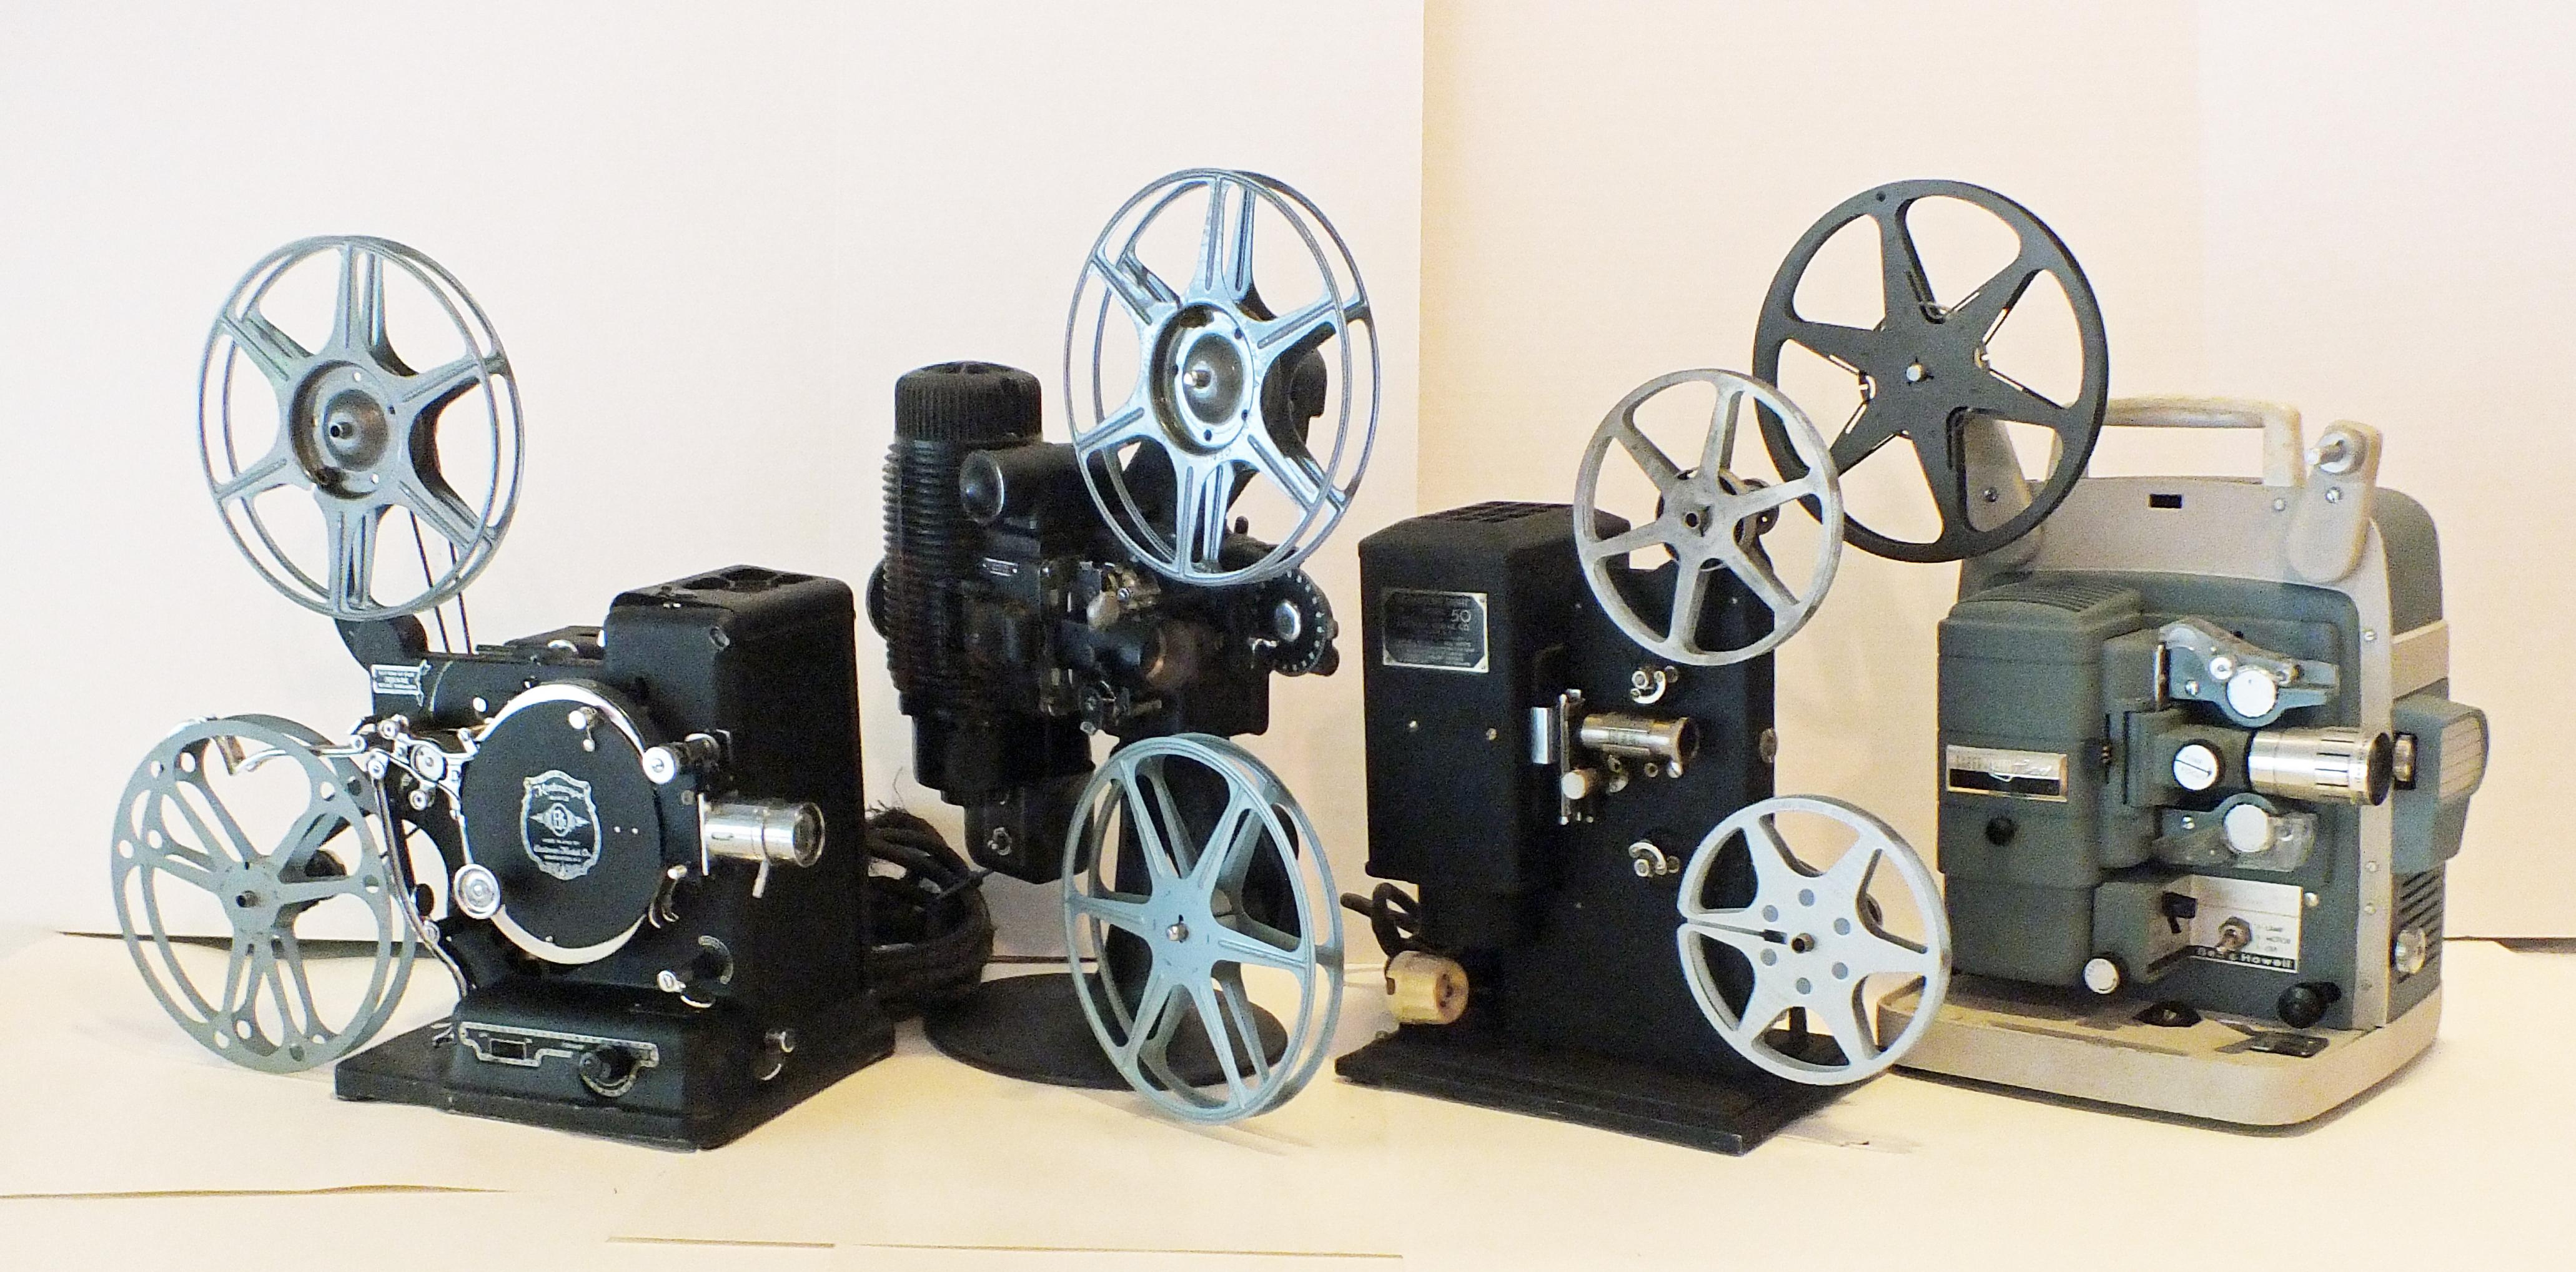 https://0201.nccdn.net/1_2/000/000/0d0/b3e/vintage-projectors.jpg